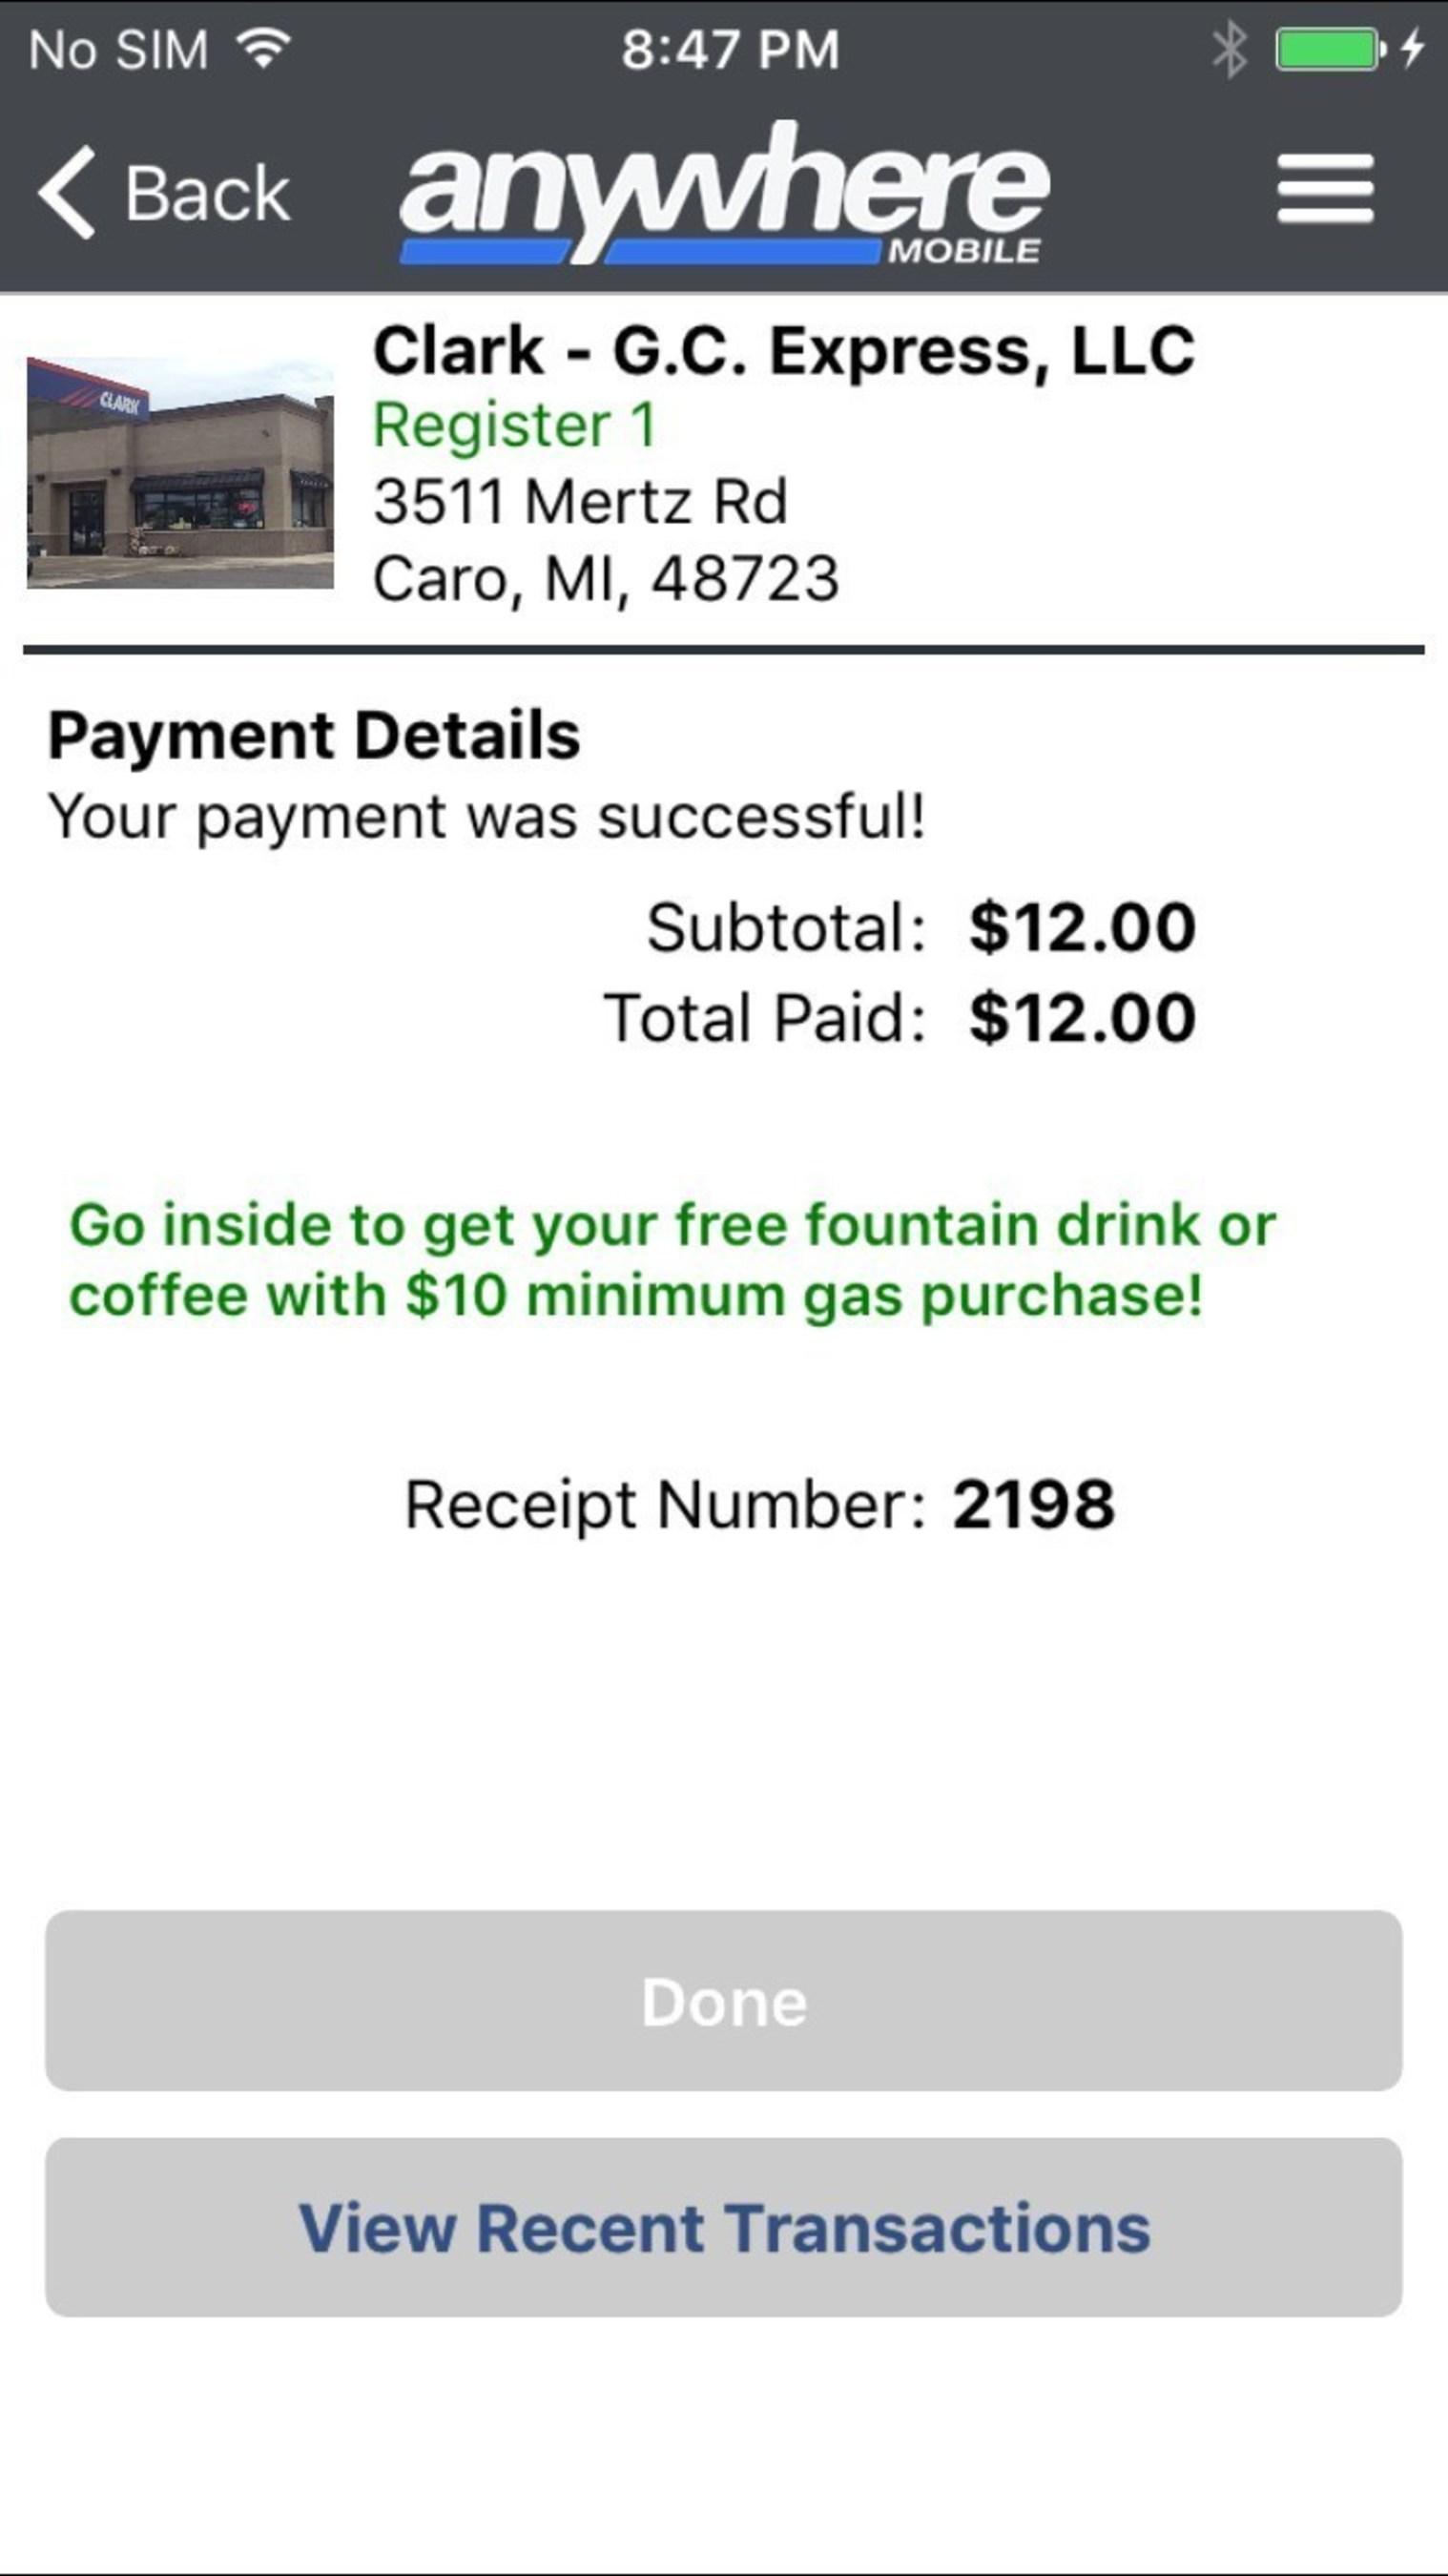 Merchant-Funded Rewards Build Customer Loyalty